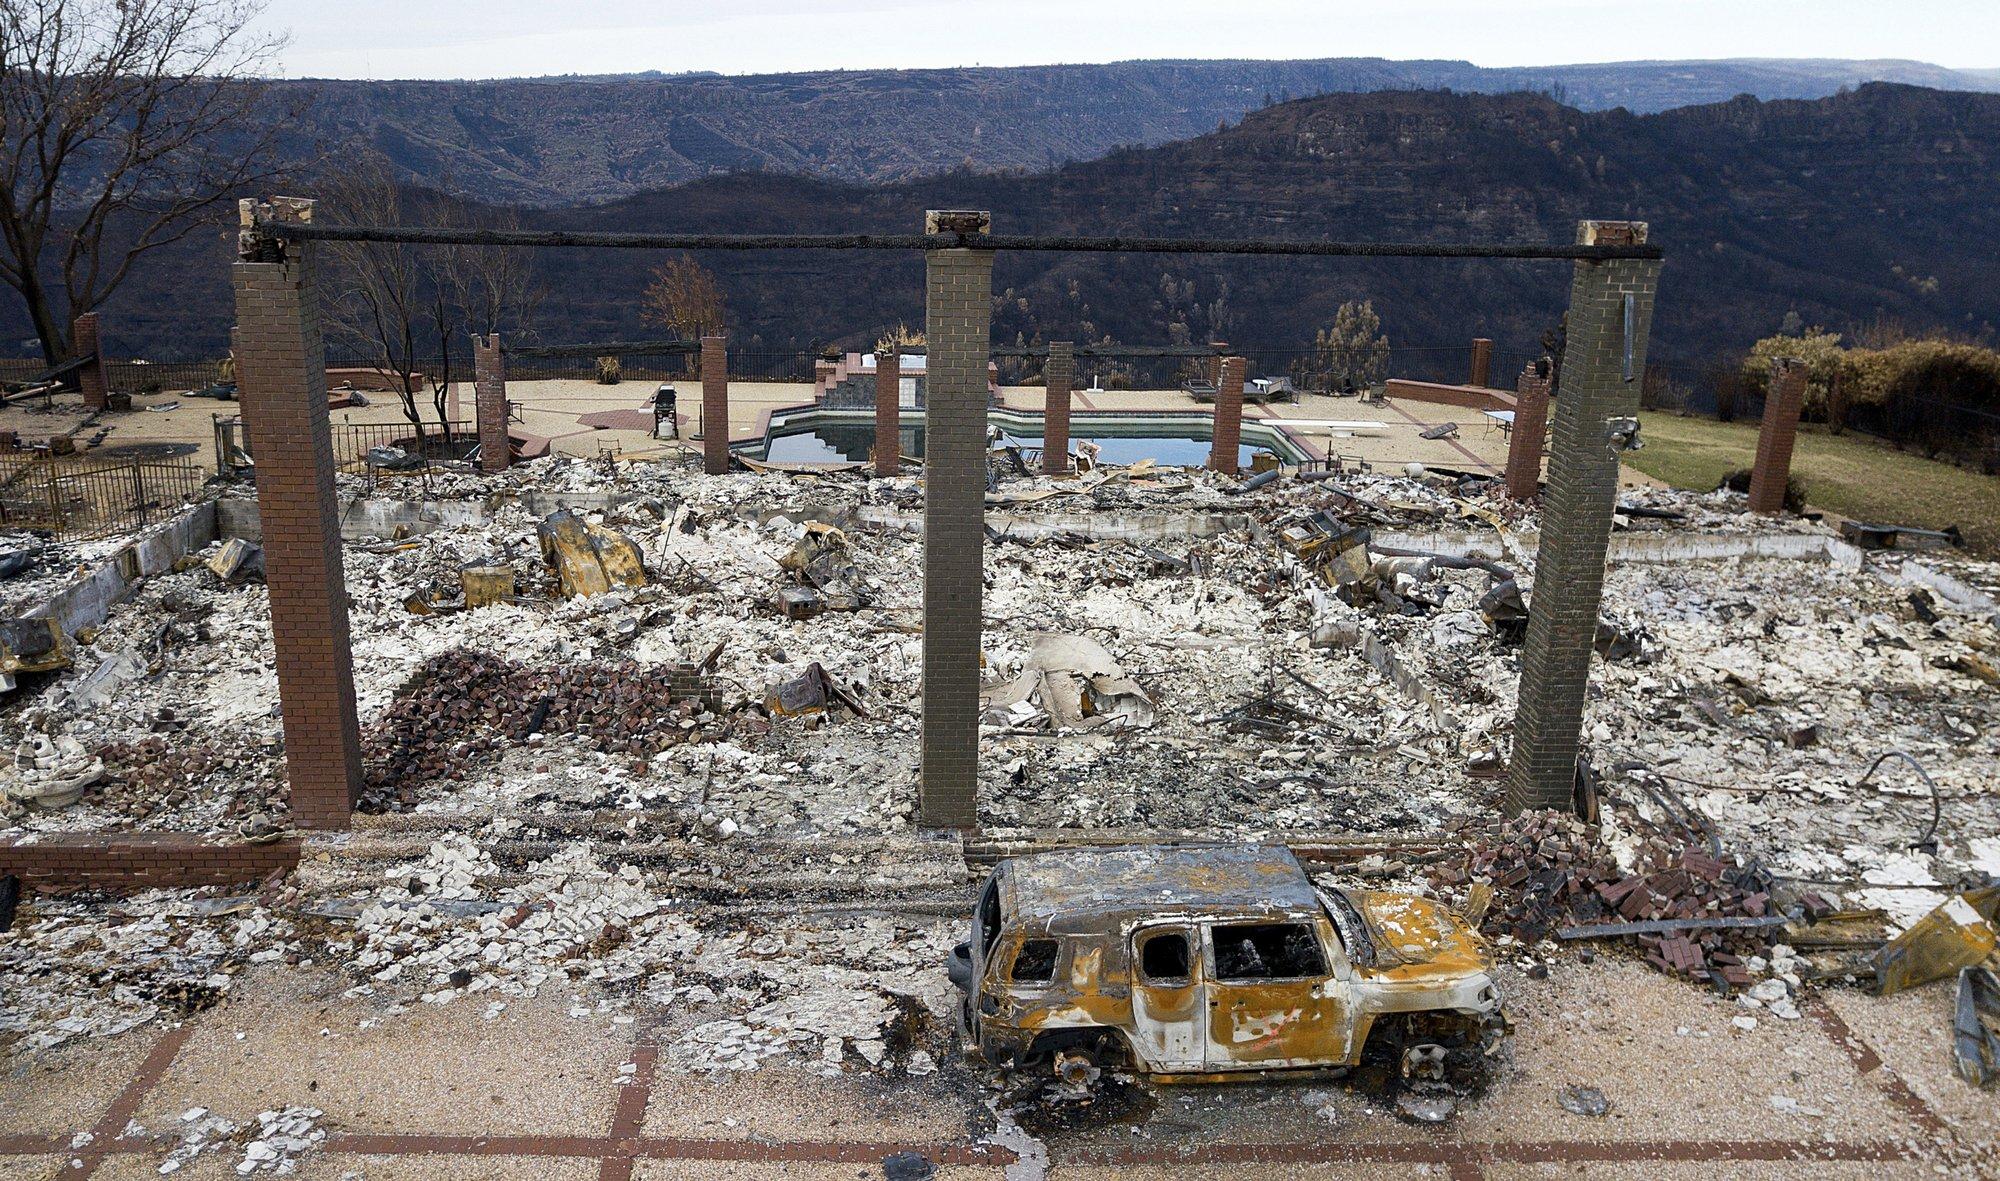 PG&E: Company equipment 'probable' cause of California fire